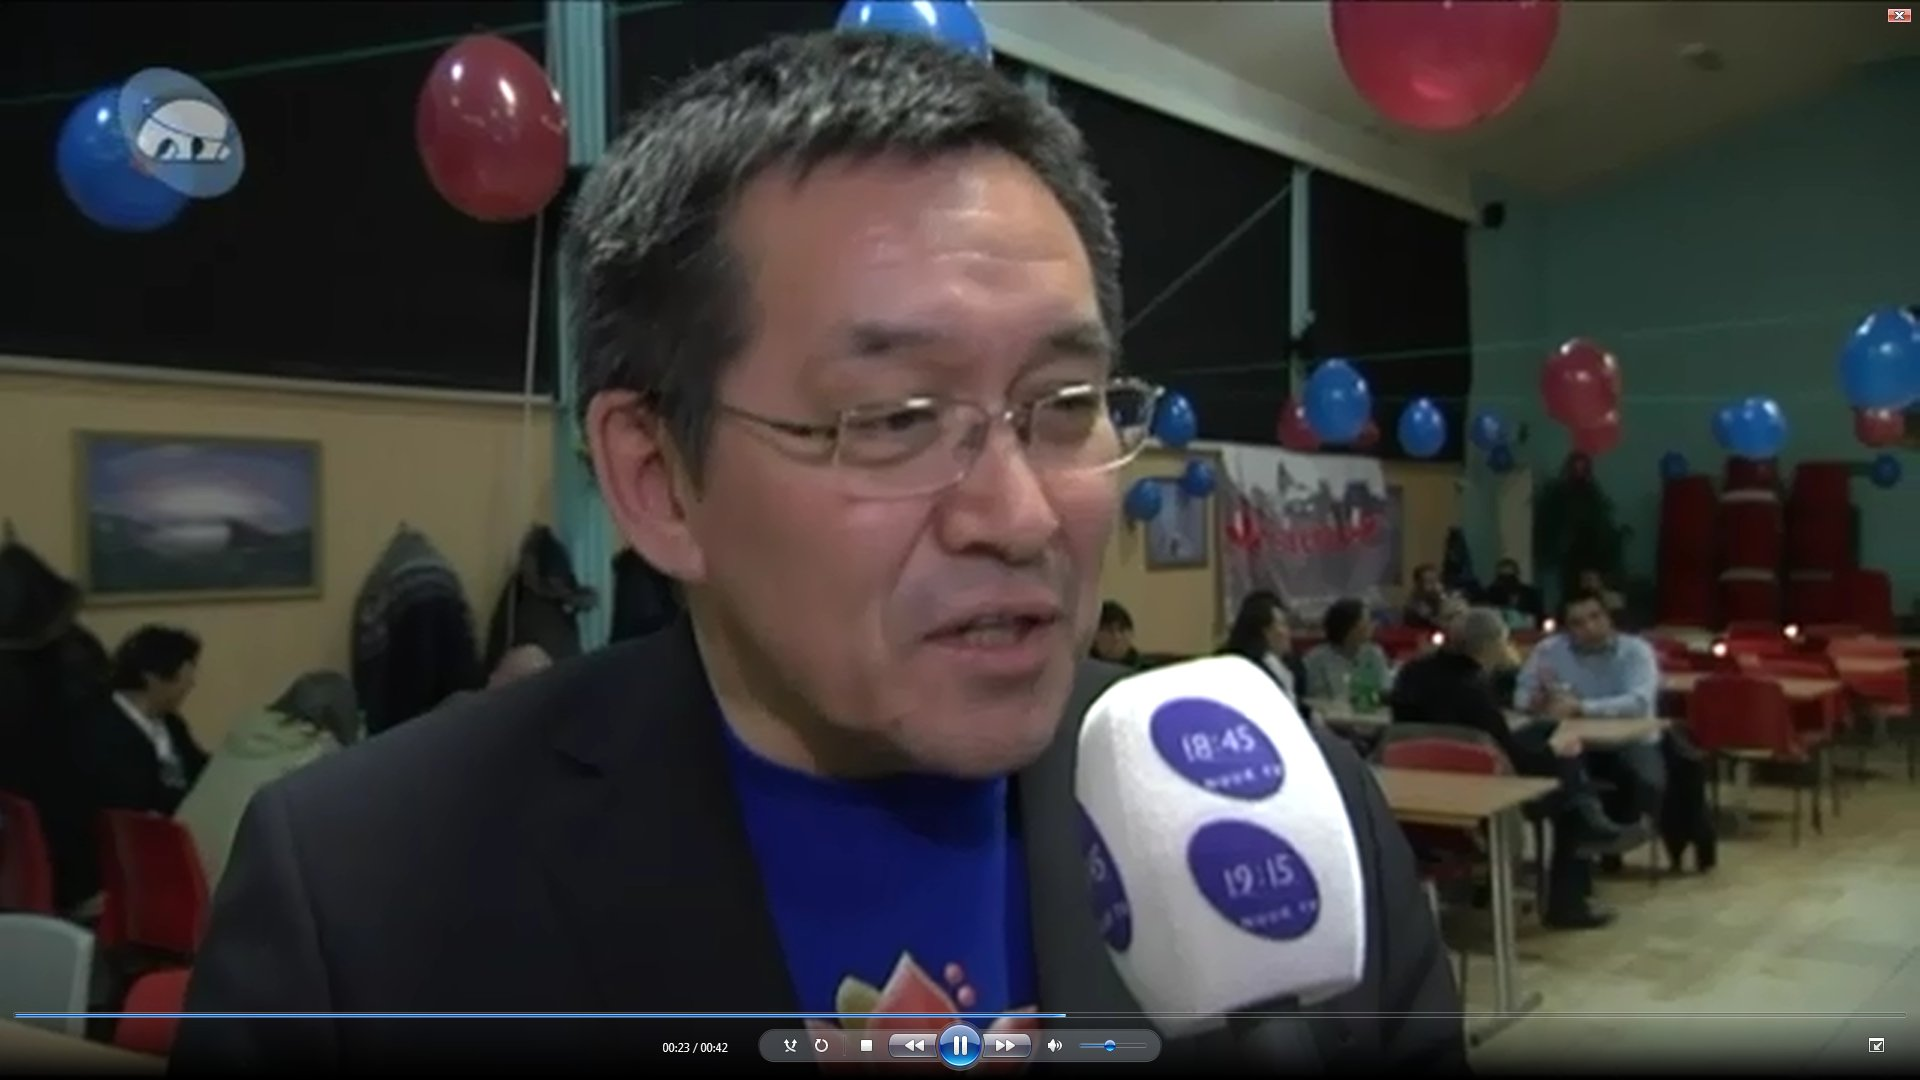 Kommunalvalg: Siumut